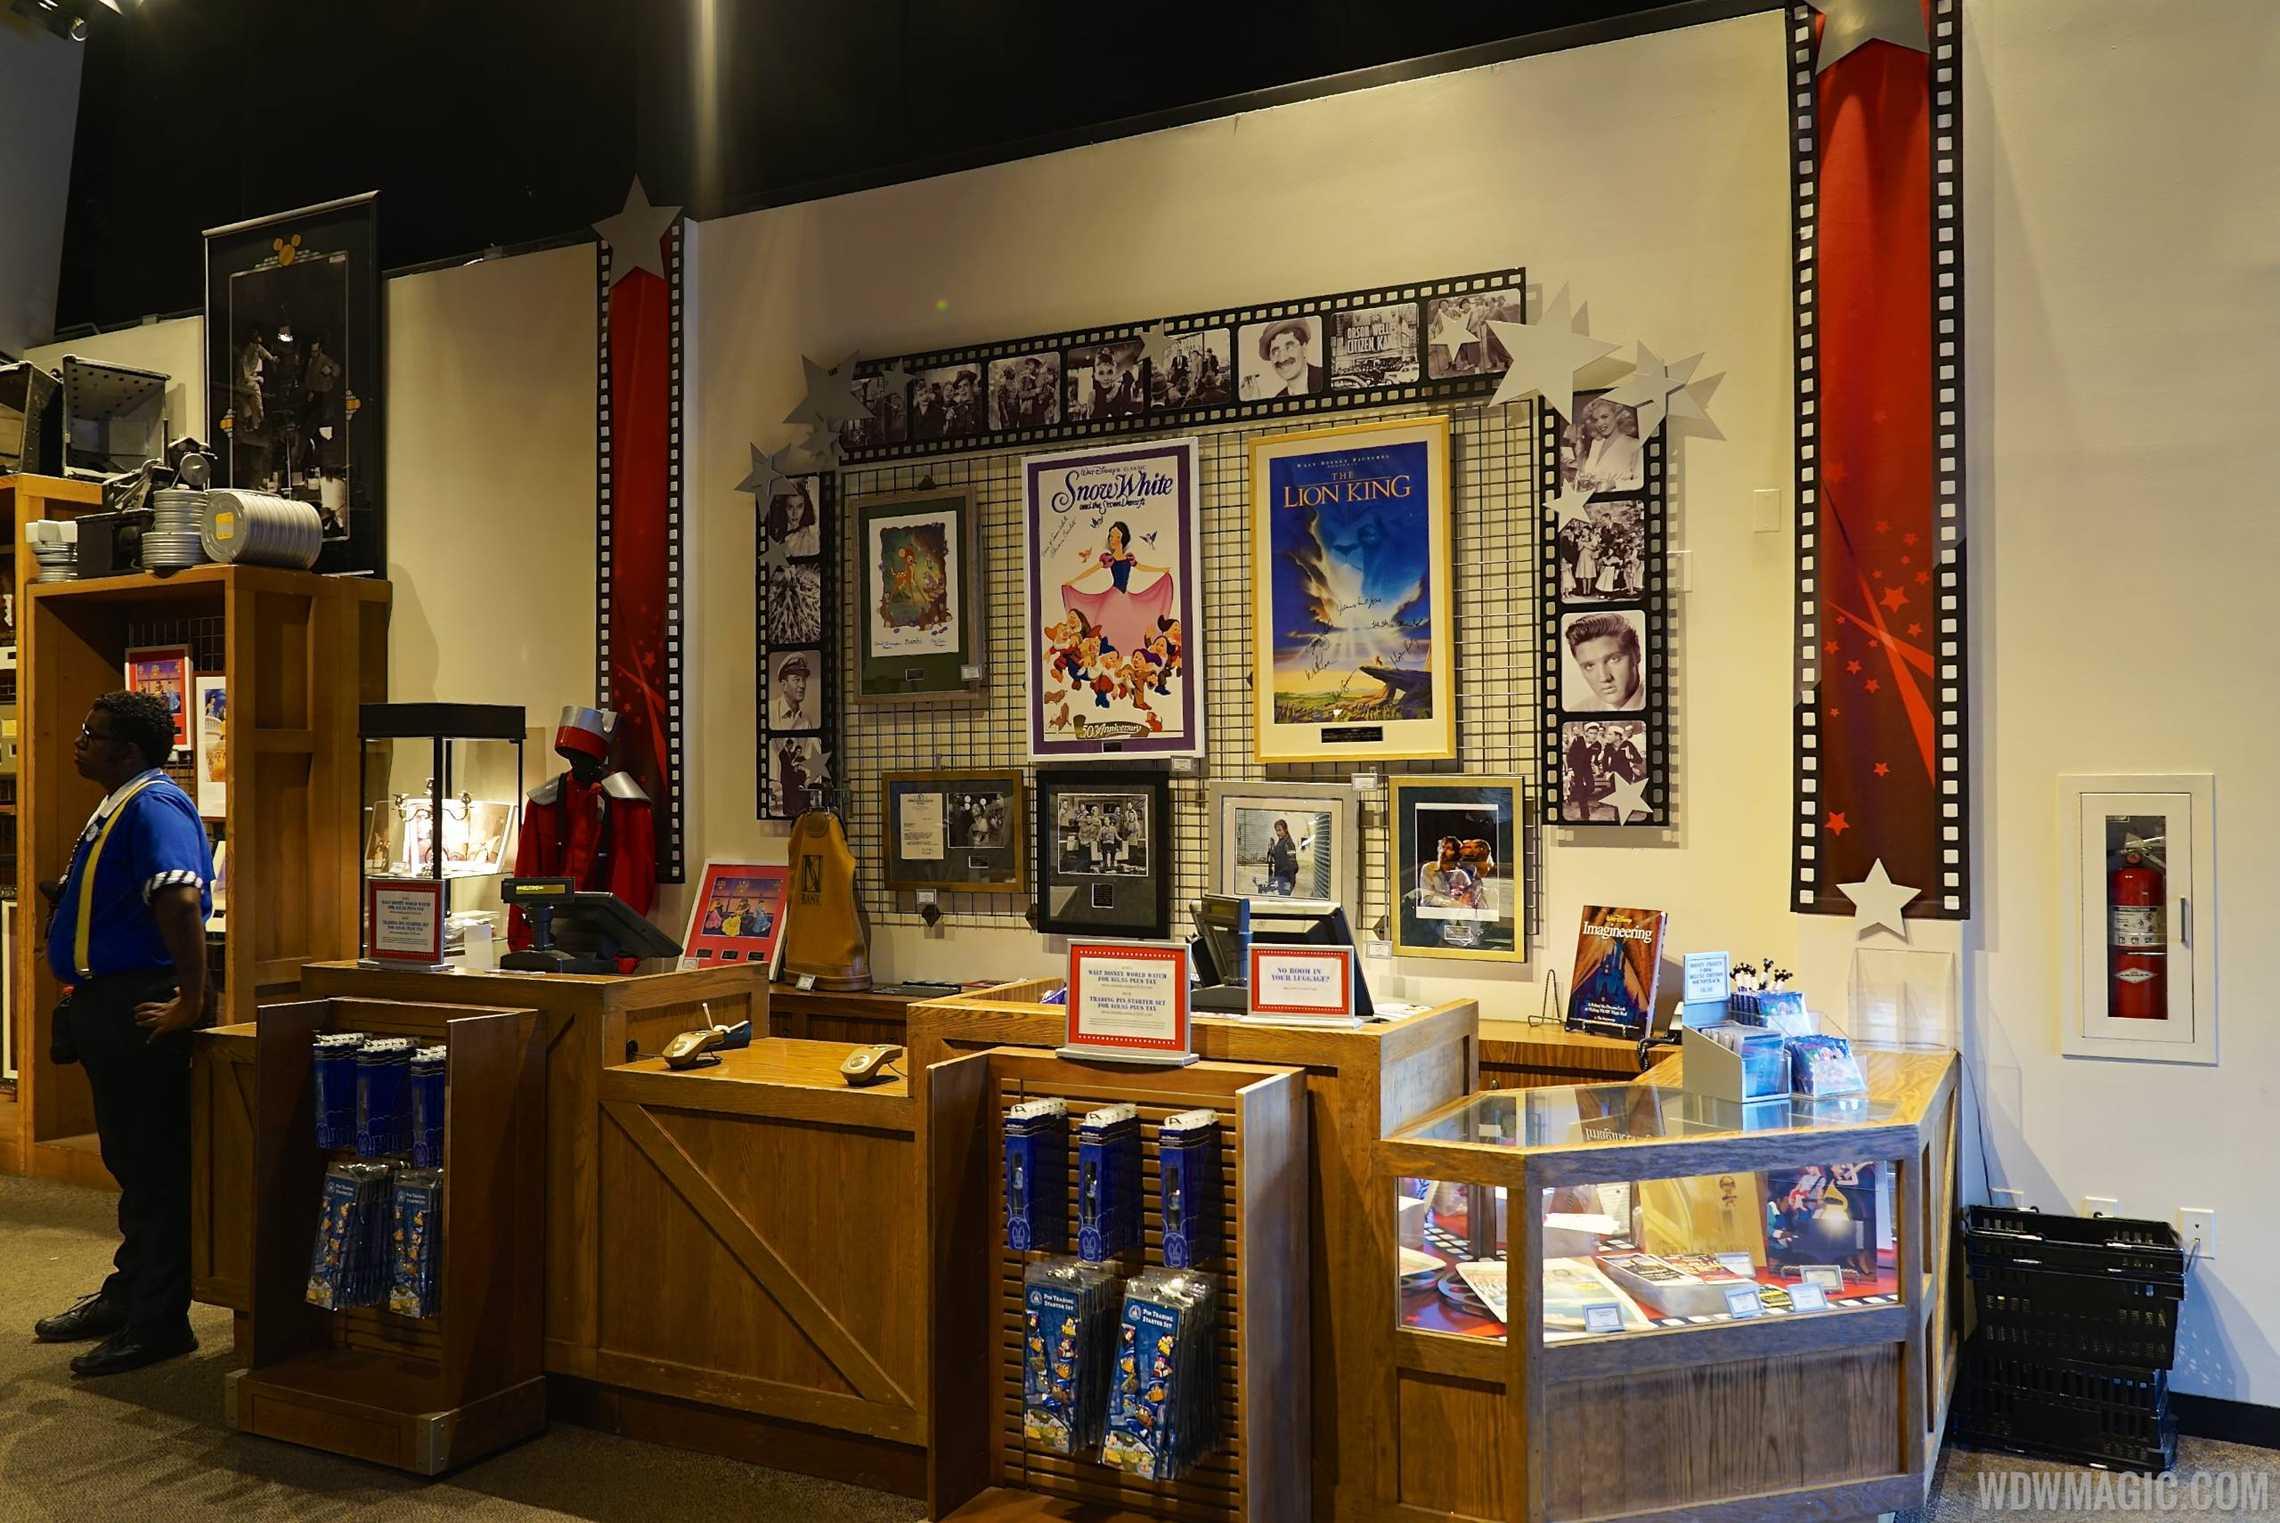 AFI Showcase - The Showcase Shop